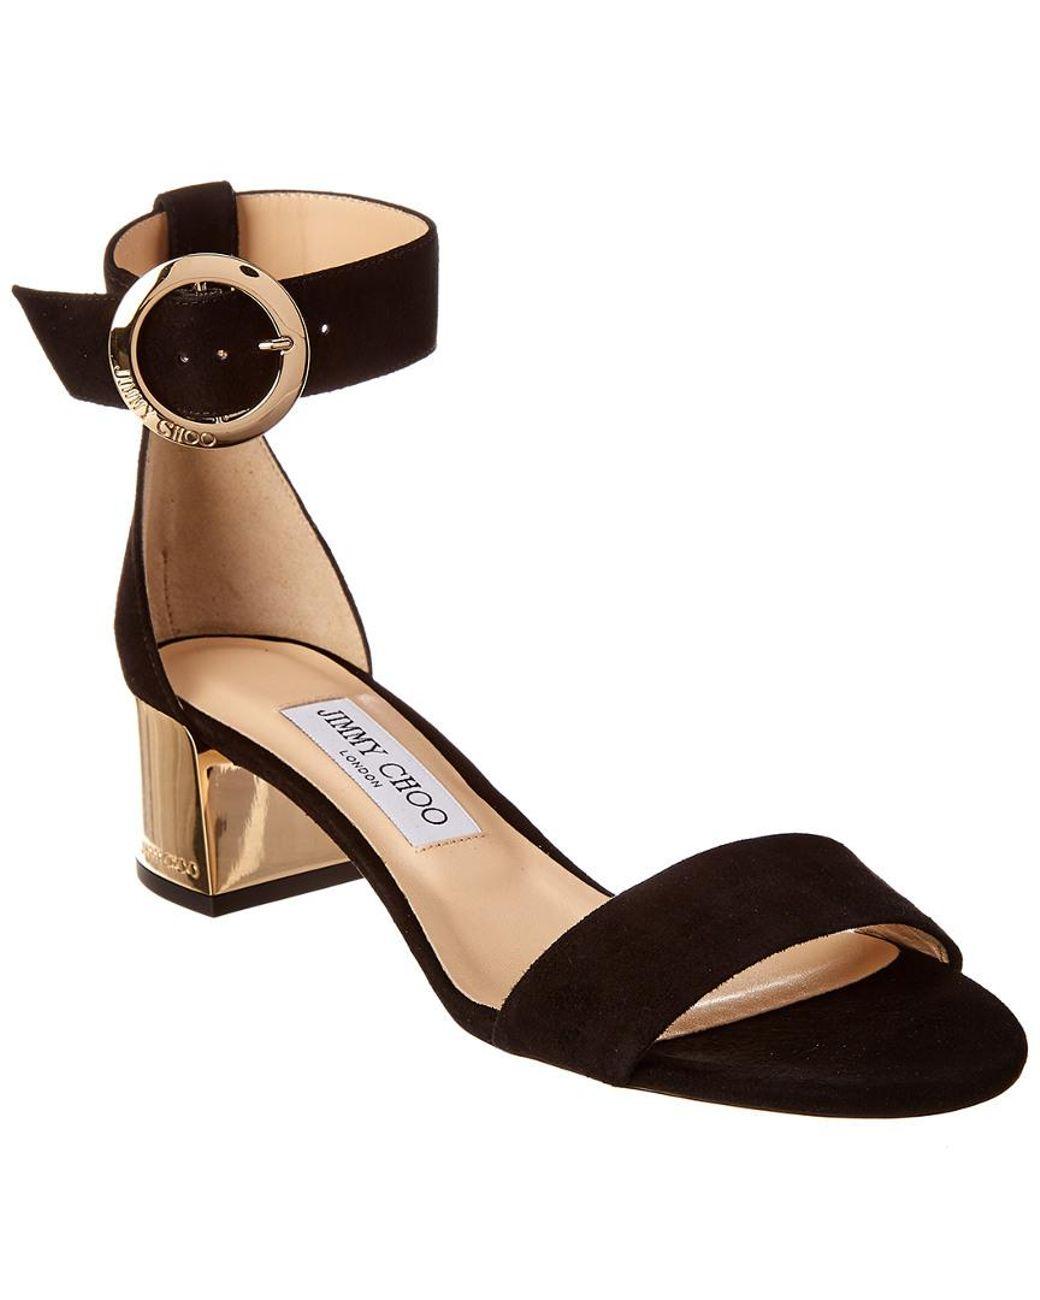 5ef9728a6055 Lyst - Jimmy Choo Jaimie 40 Block Heel Suede Sandals - Save 21%